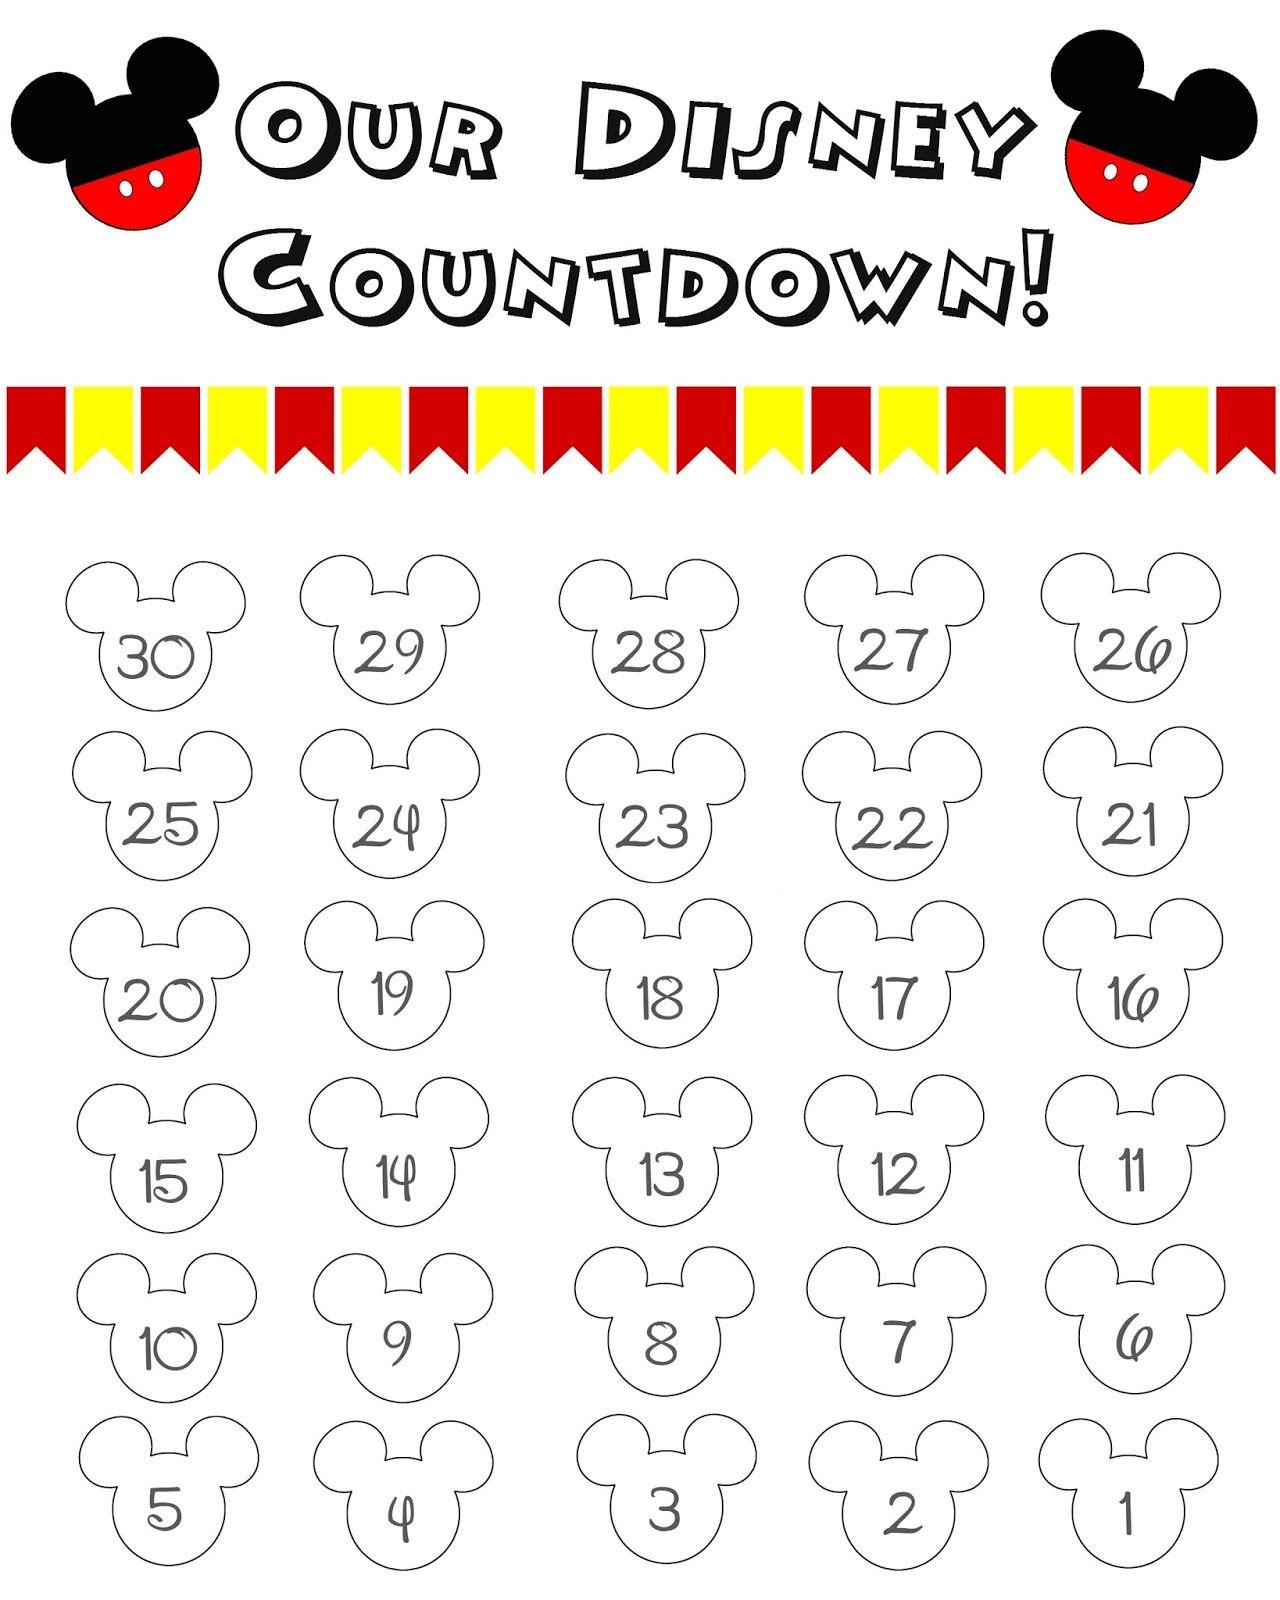 Disney World Countdown Calendar FREE Printable Disney